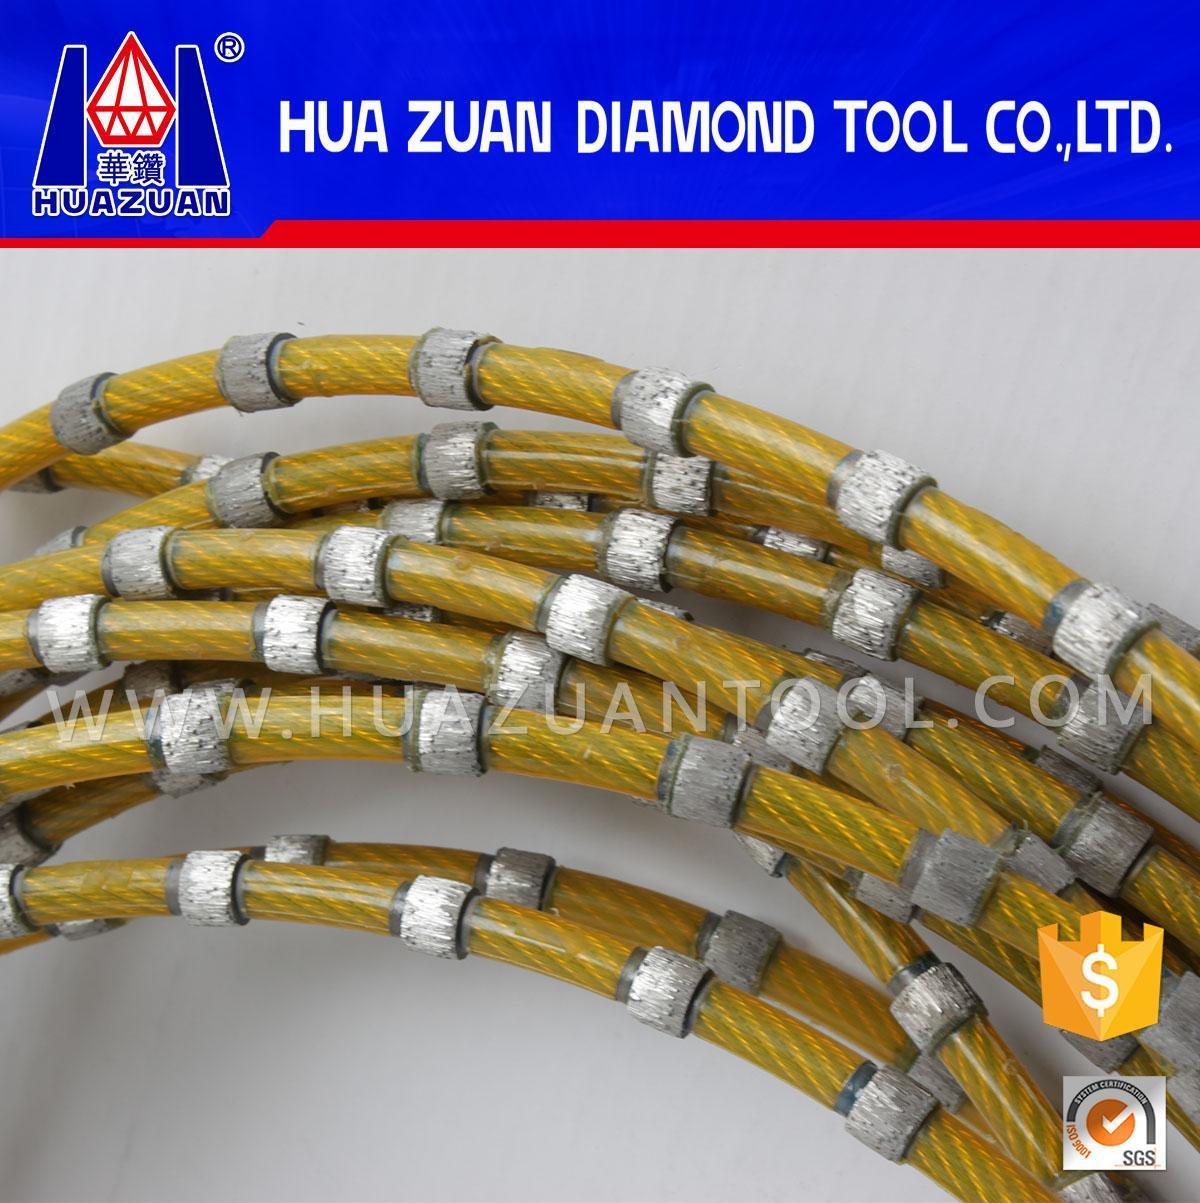 Diamond Wire Saw for Cutting Granite